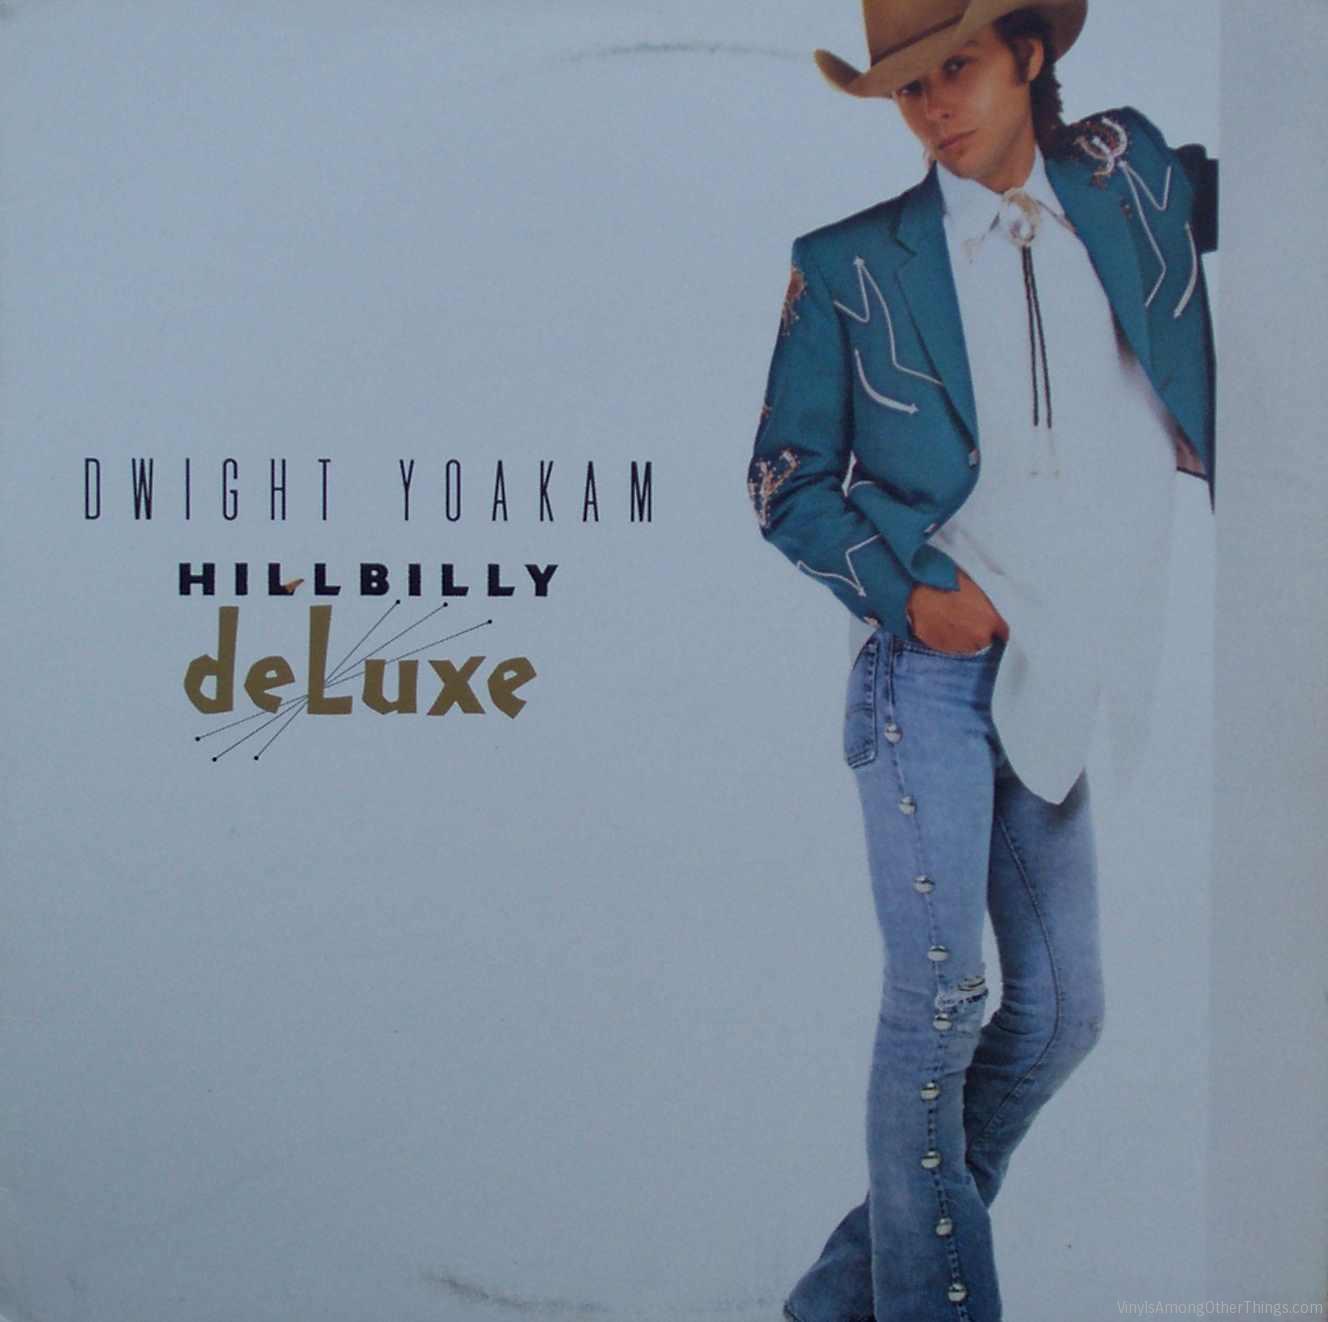 Dwight Yoakam Country singer, Actor   TV Guide  Dwight Yoakam 1980